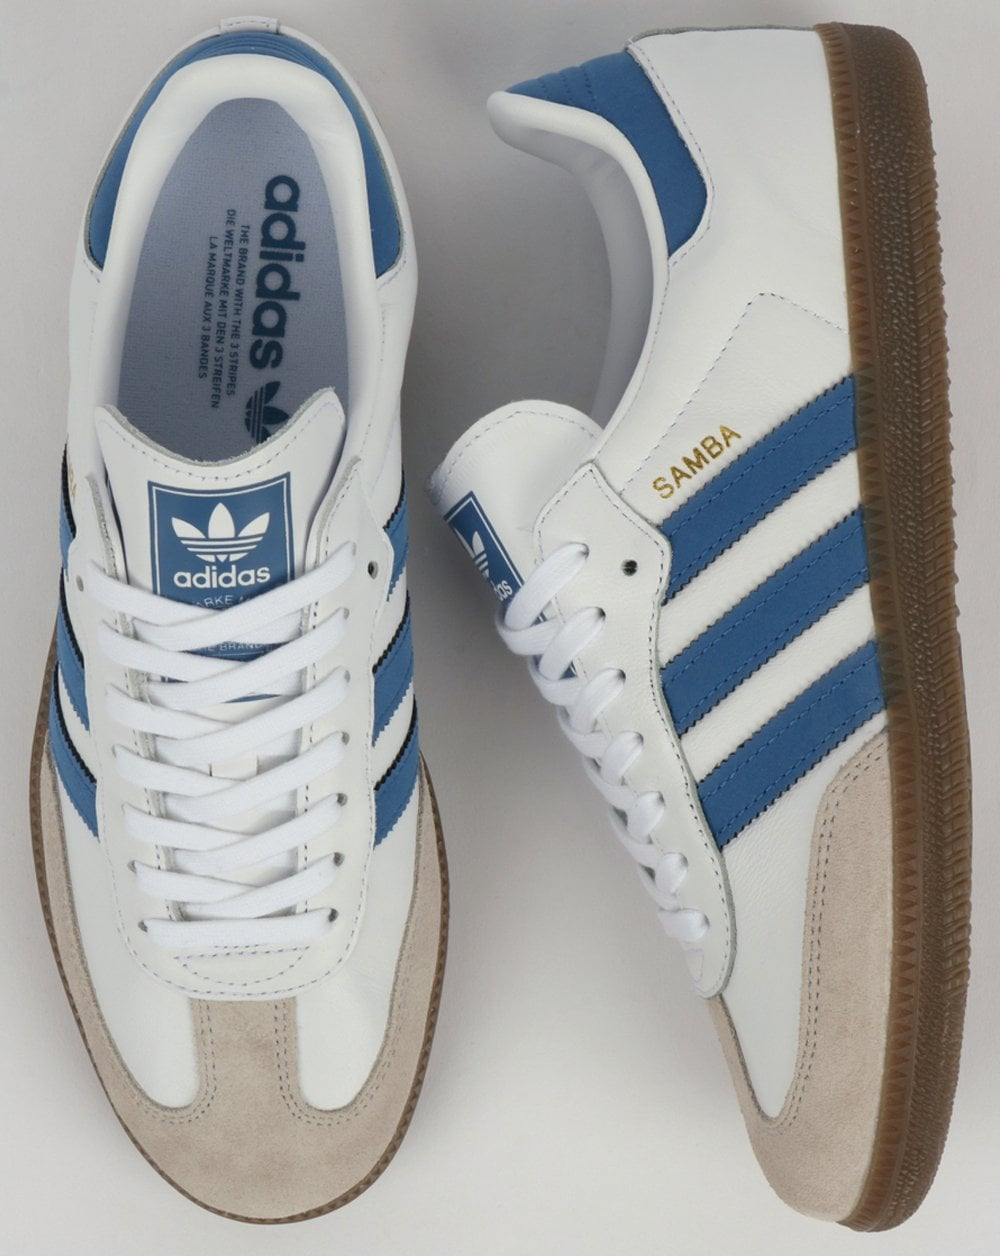 adidas samba blue and white Online